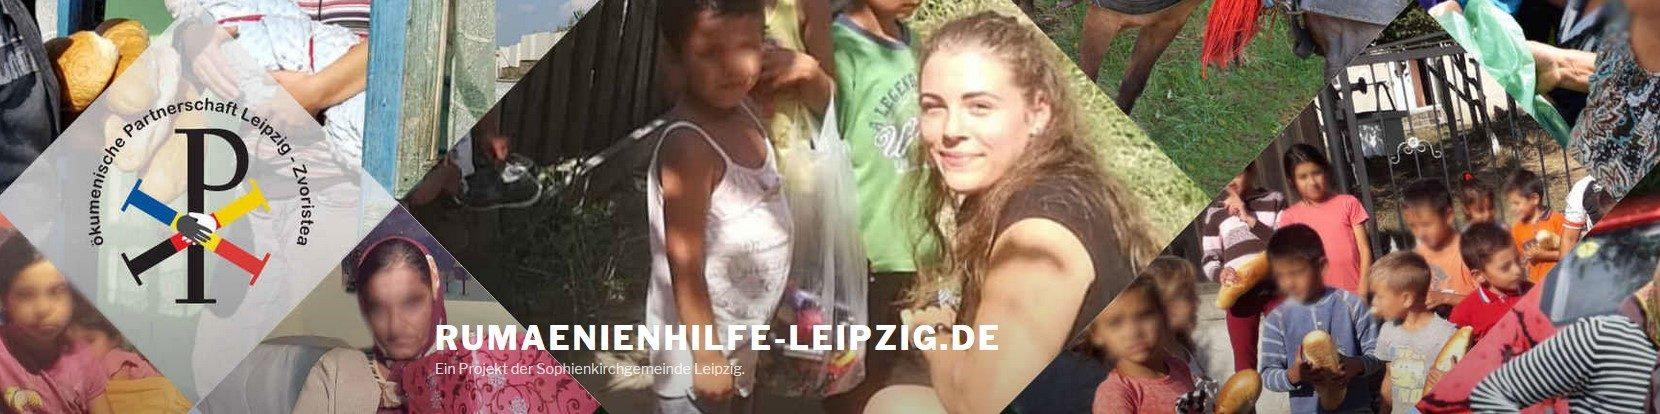 Rumänienhilfe Leipzig